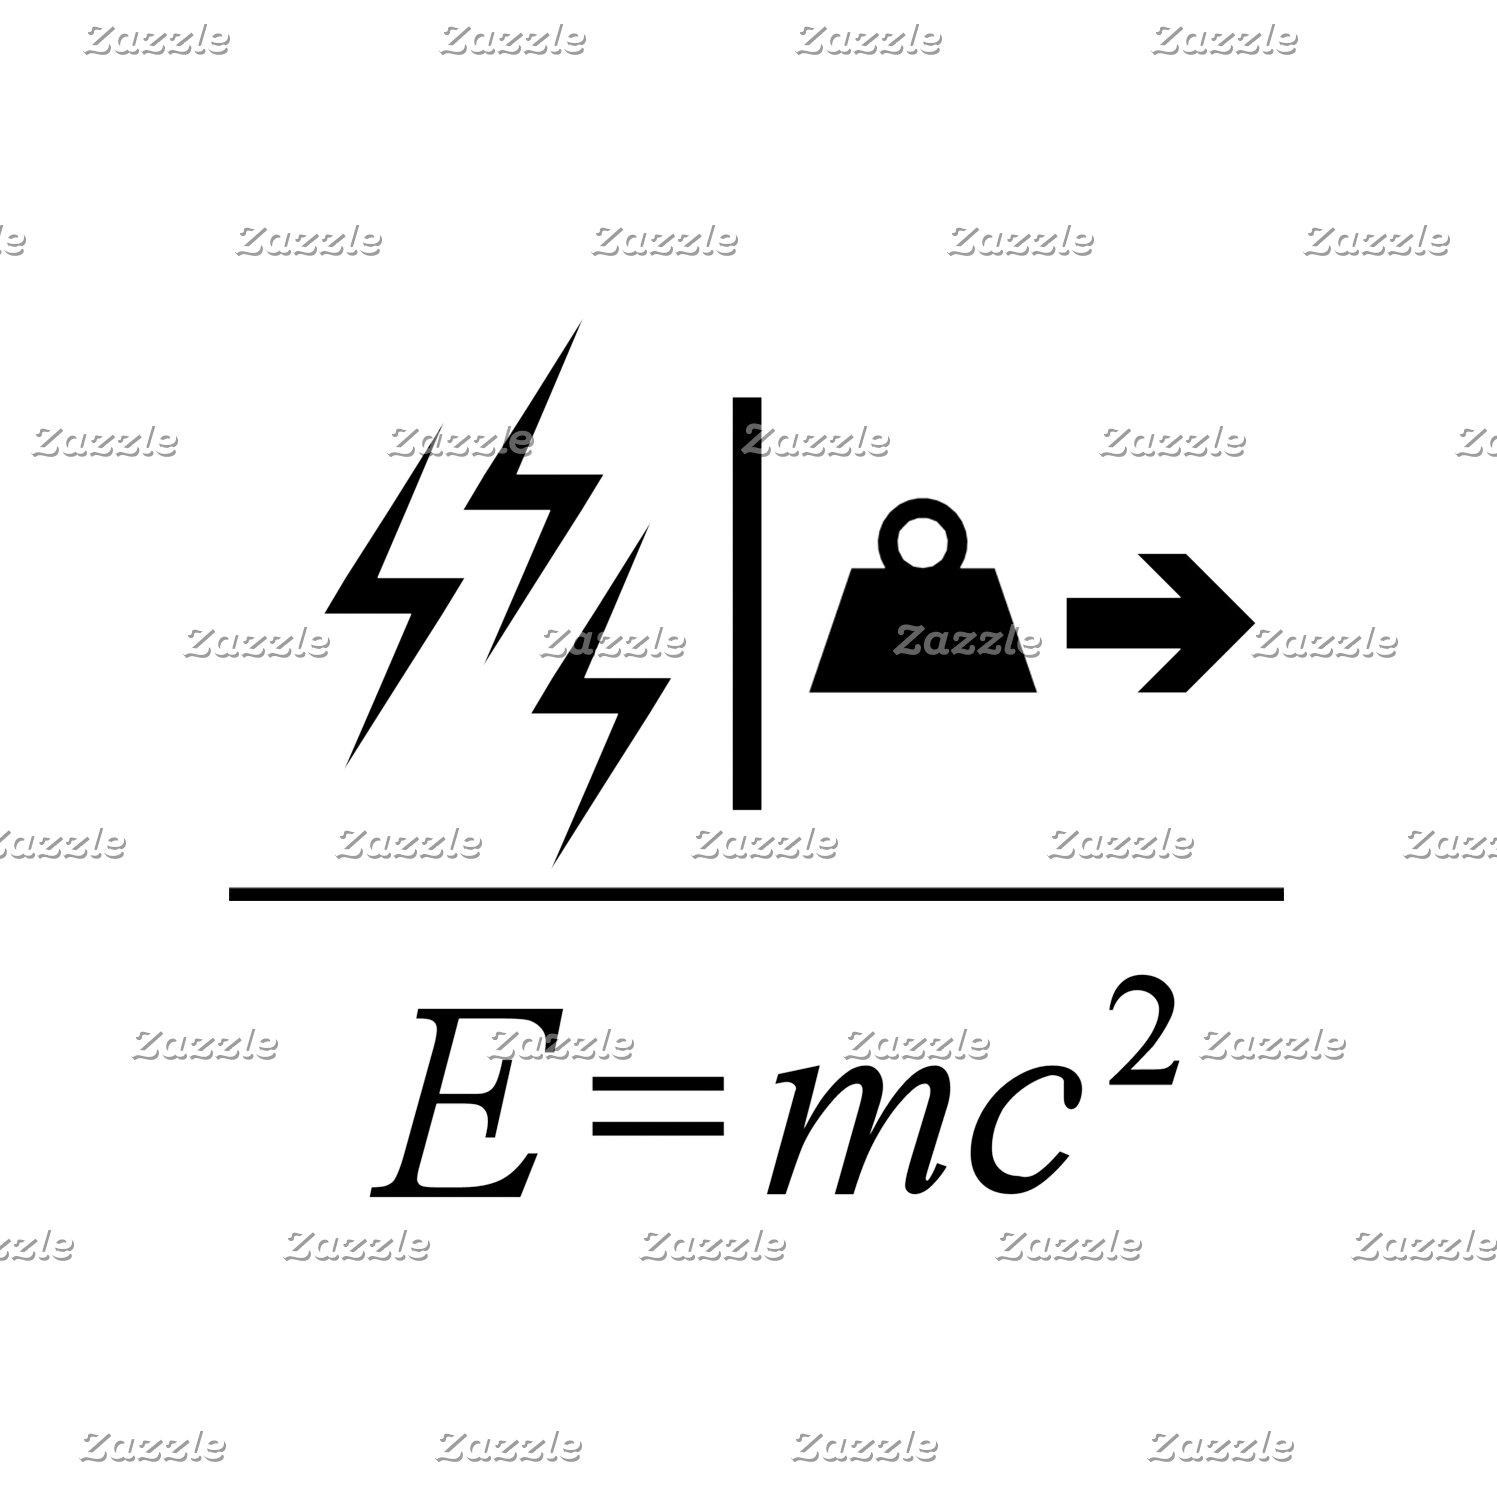 Mass Energy Equivalence